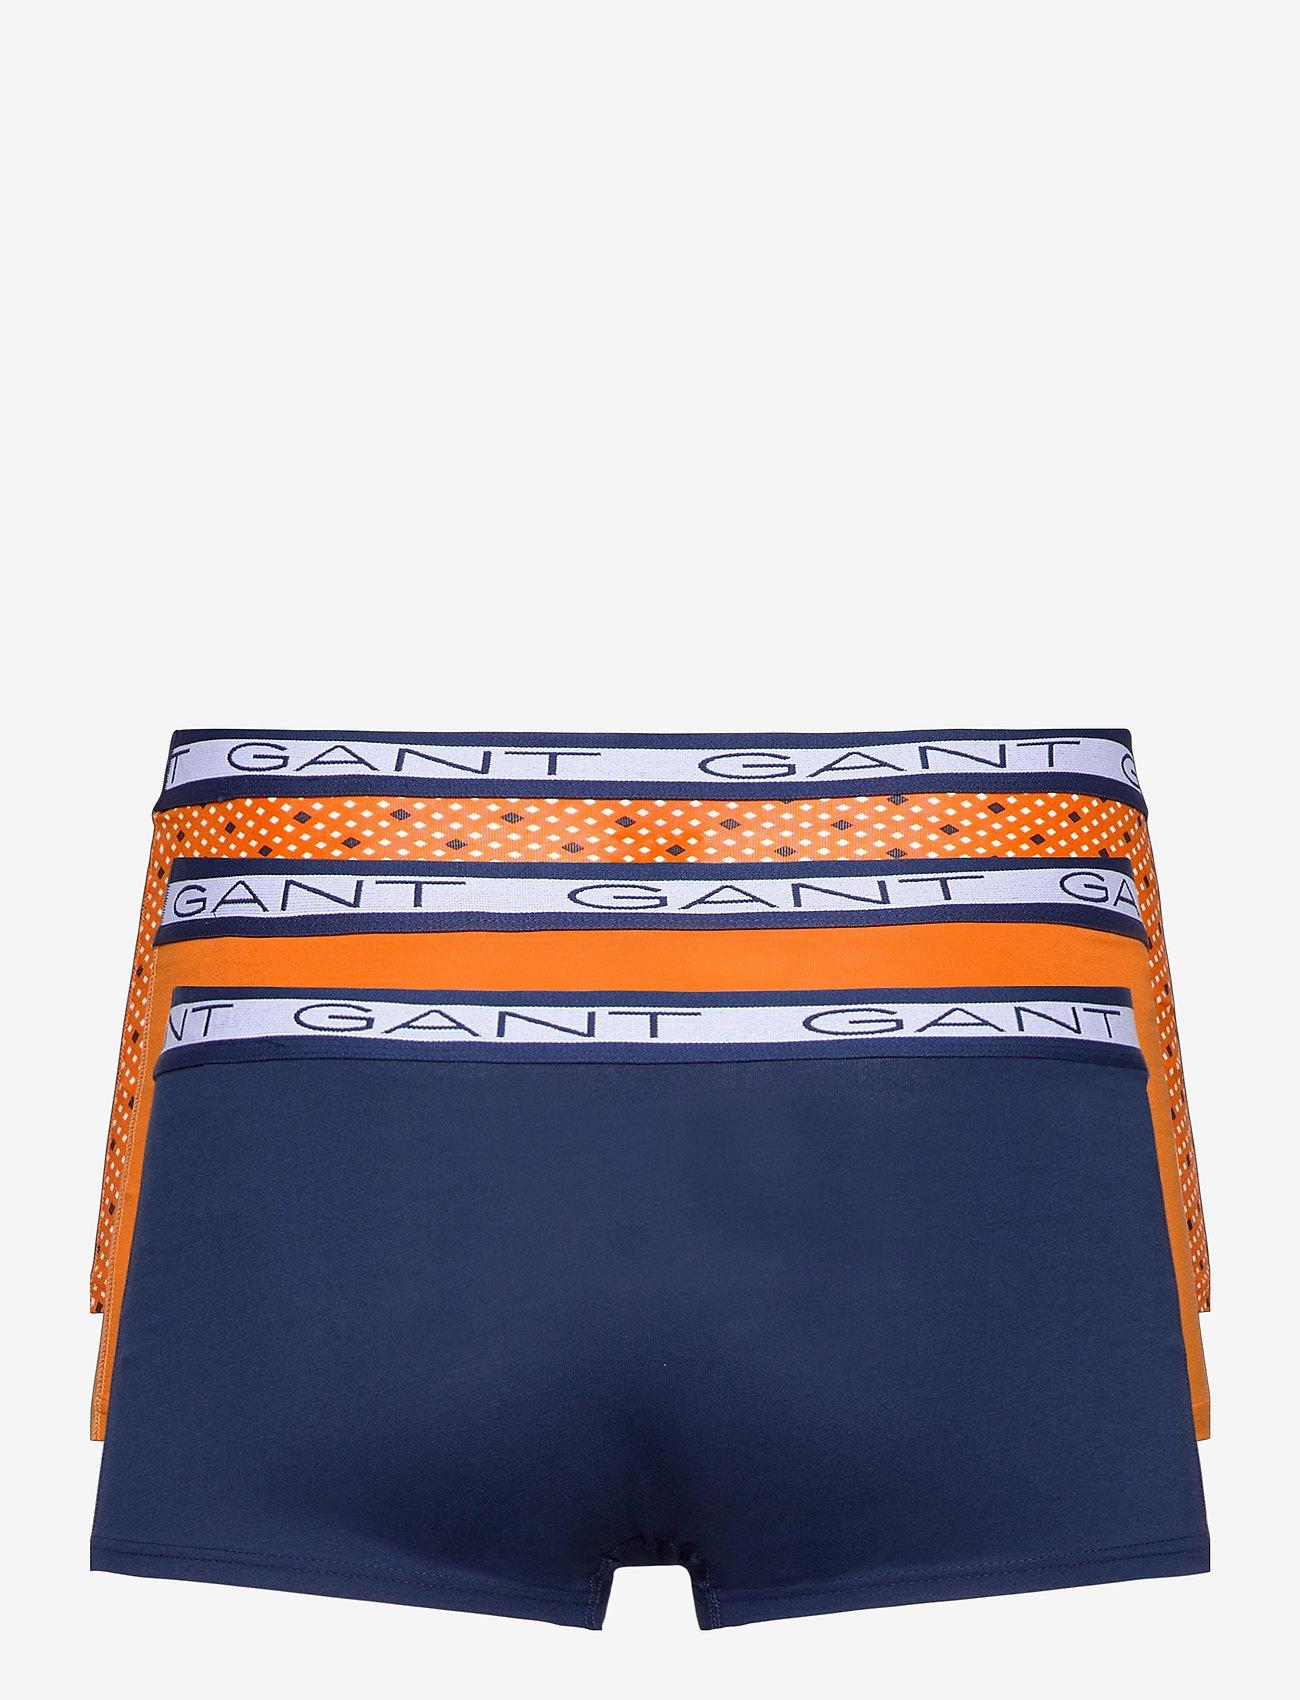 GANT - DIAMOND DOT BASIC TRUNK 3-PACK - boxers - russet orange - 1